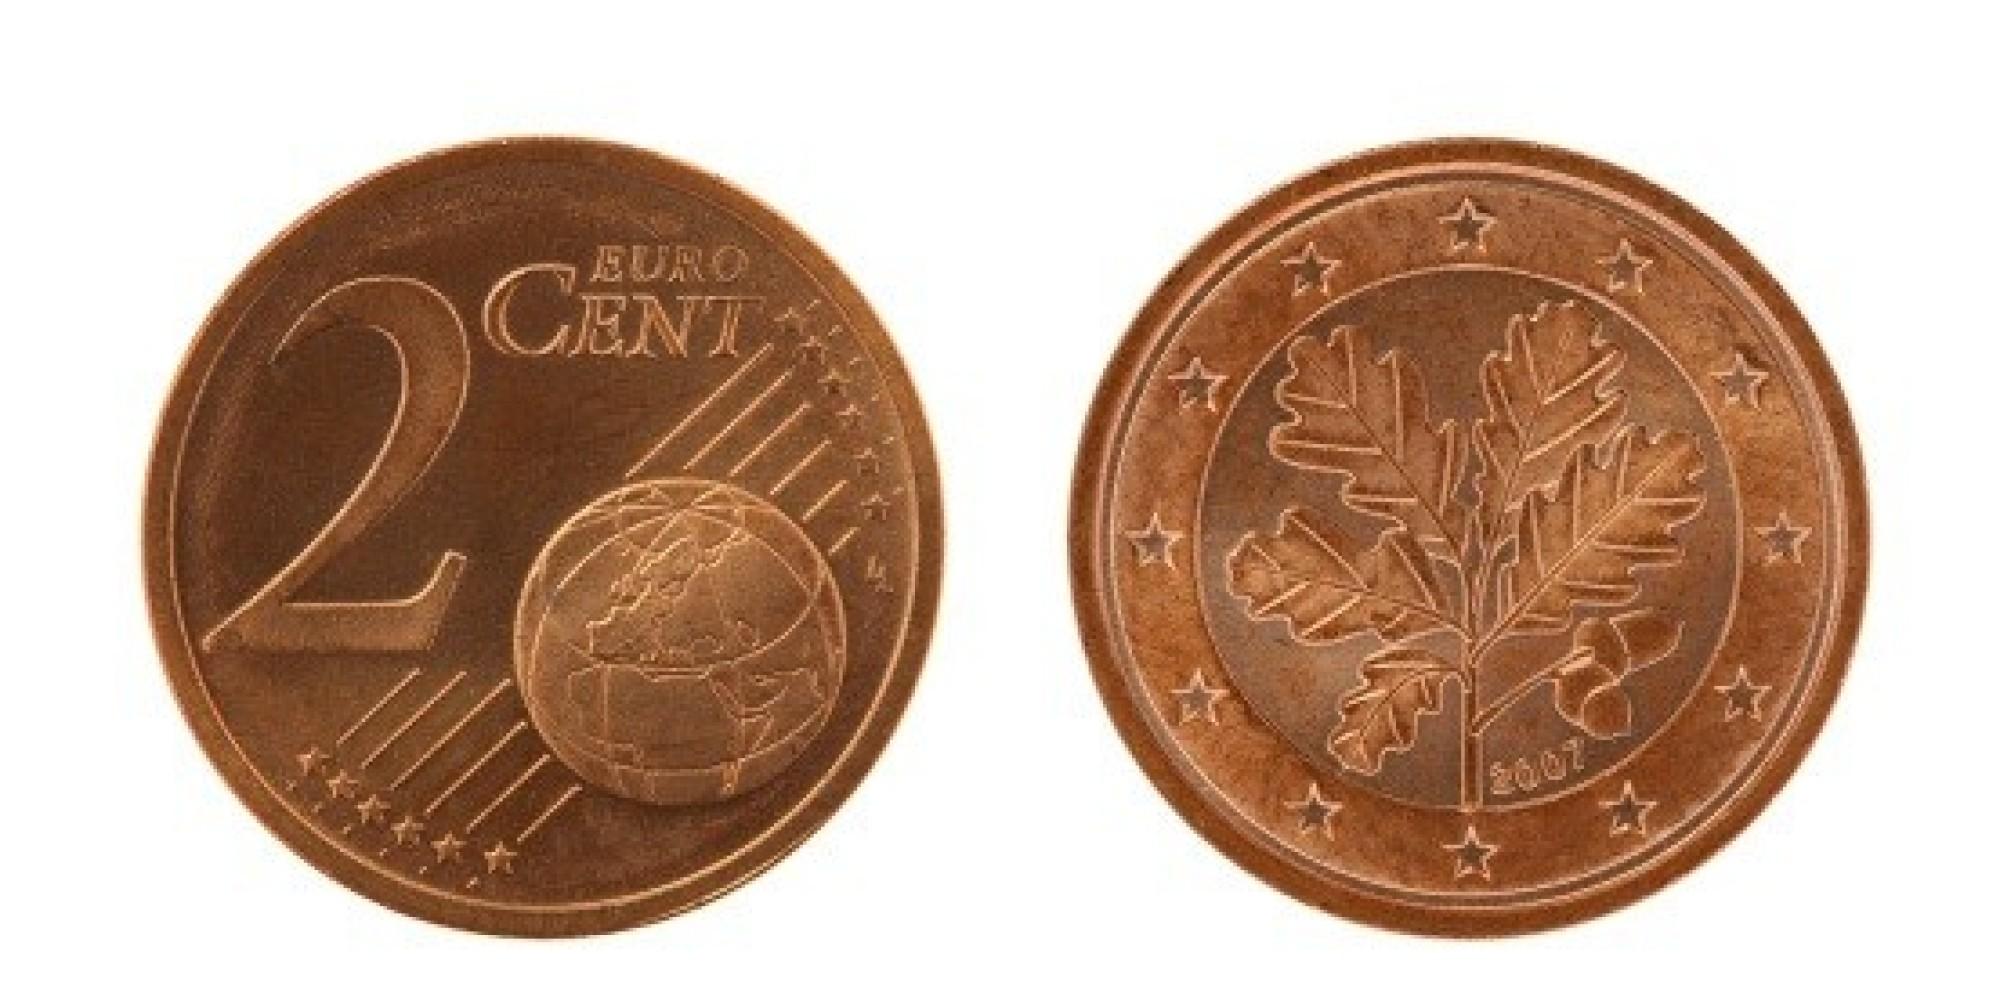 Monete da 2 Euro Valore Monete da 1 e 2 Centesimi